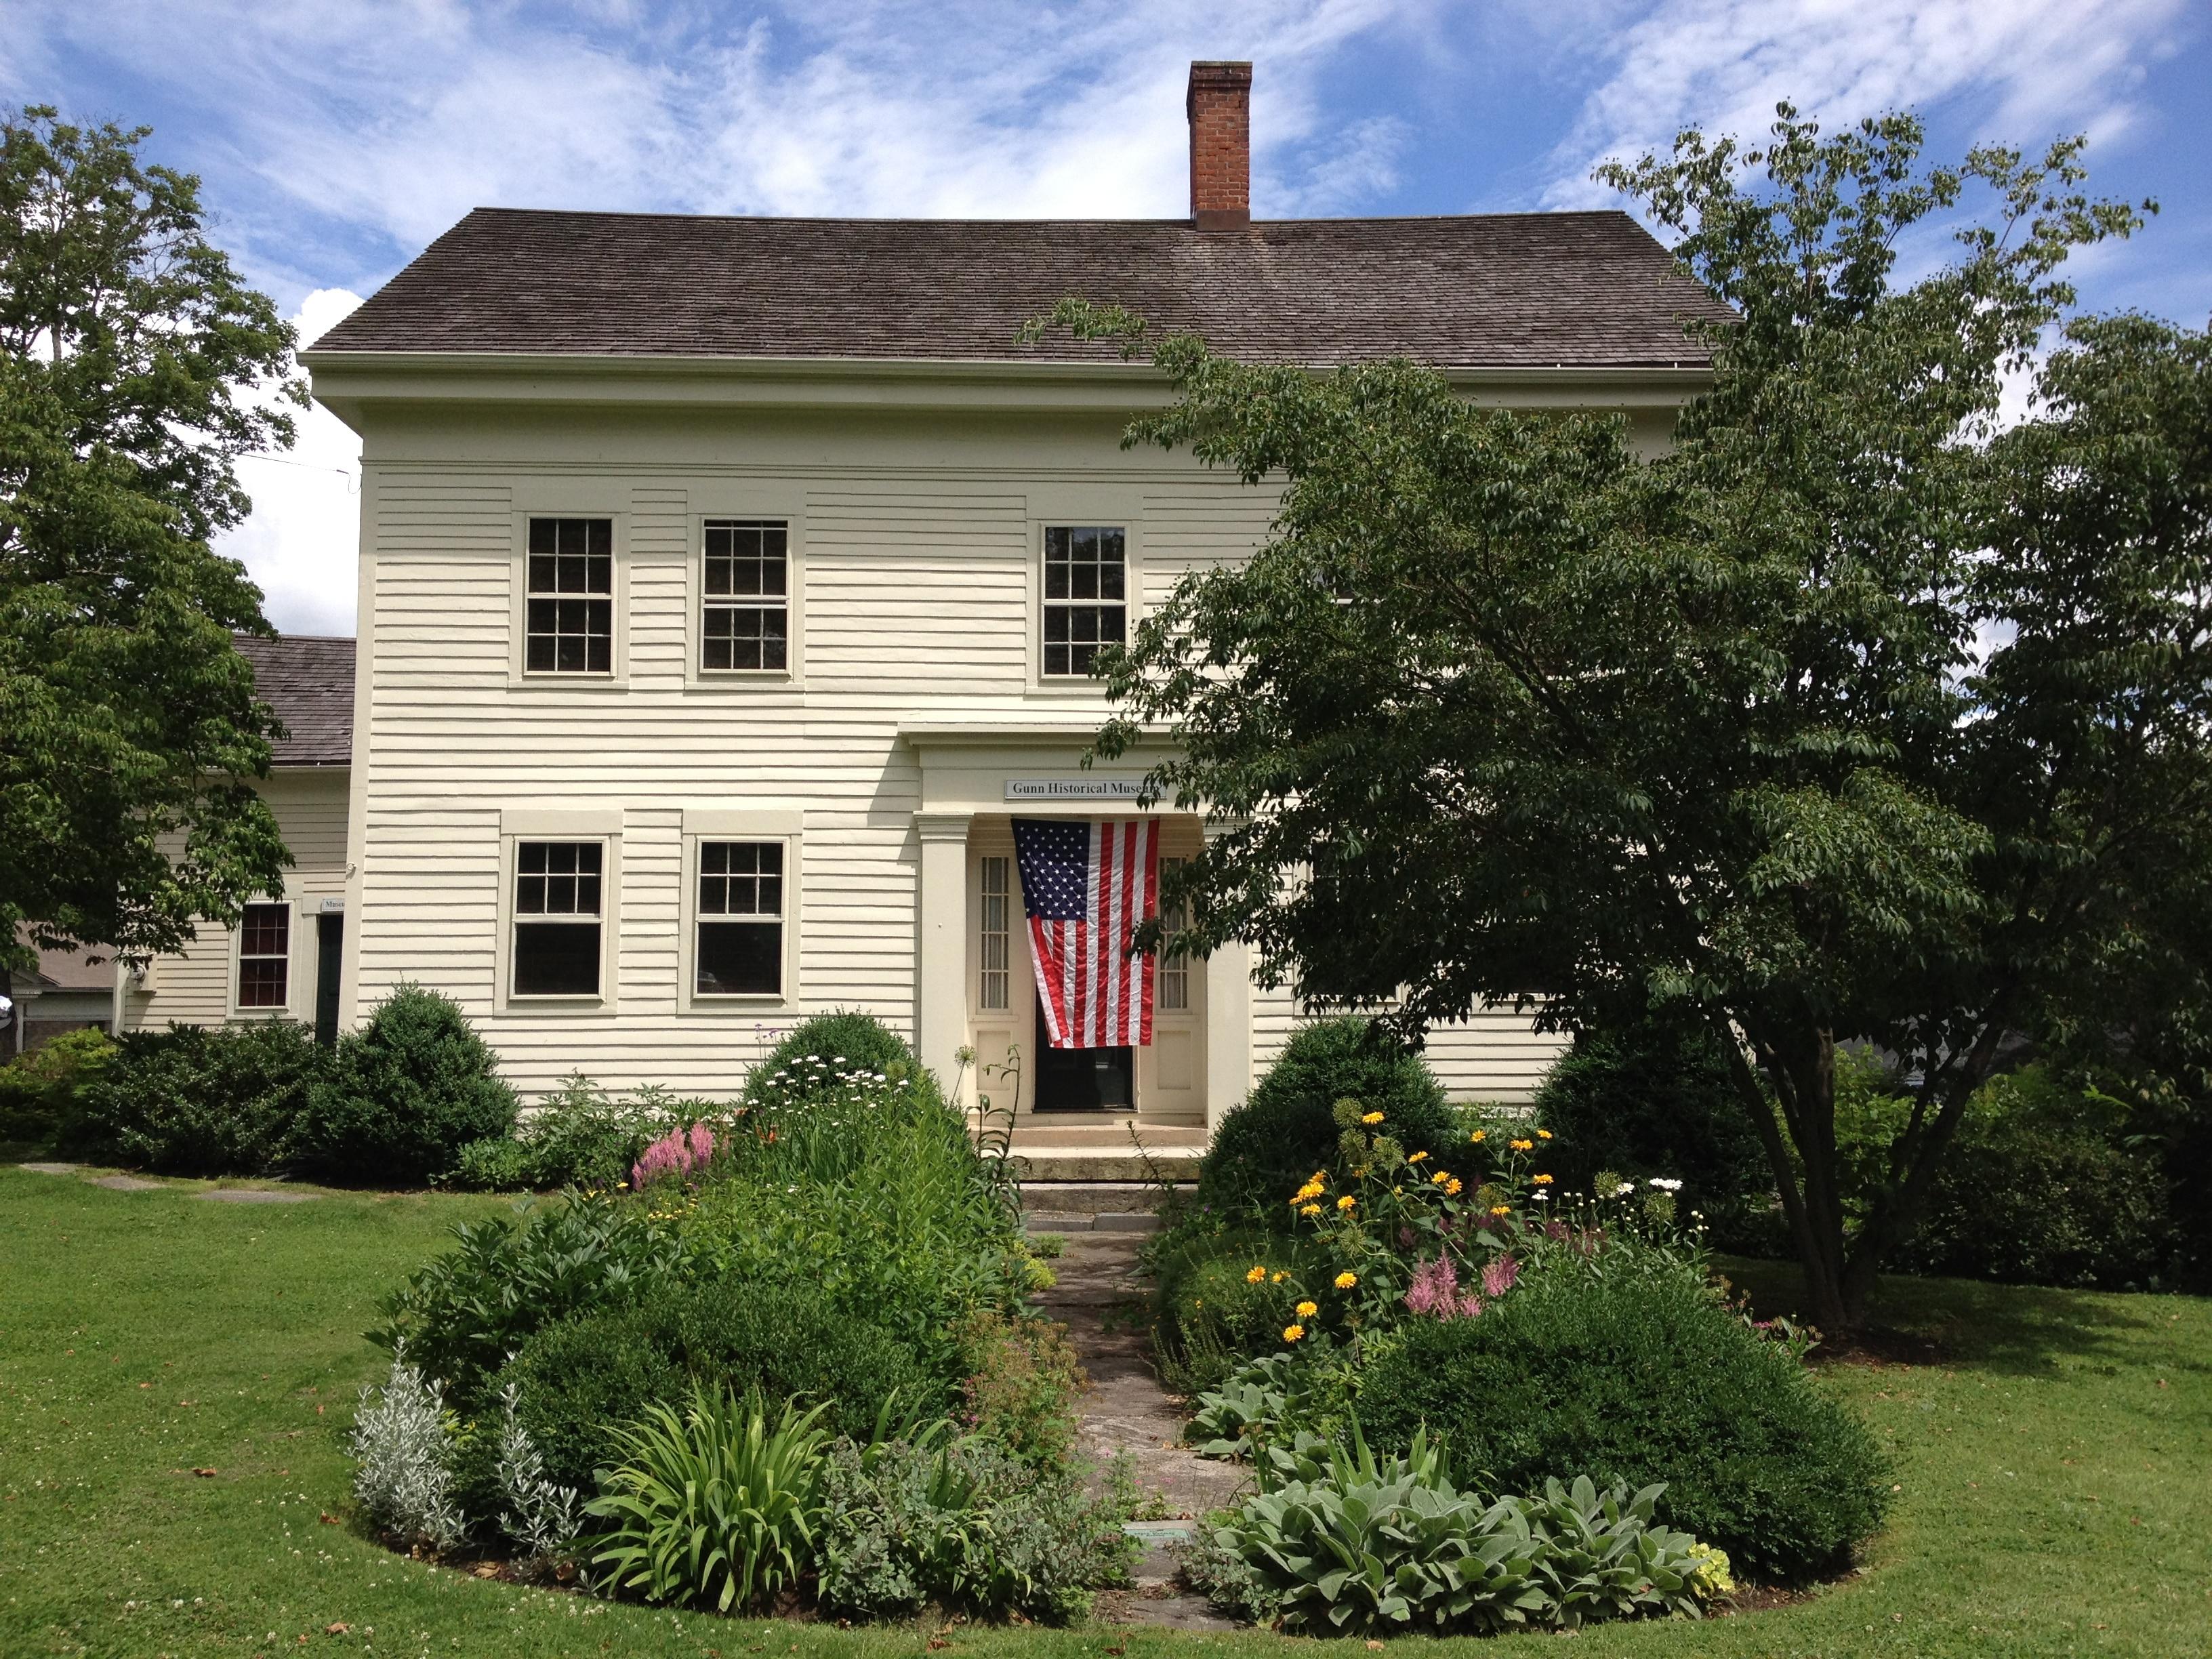 Gunn Historical Museum